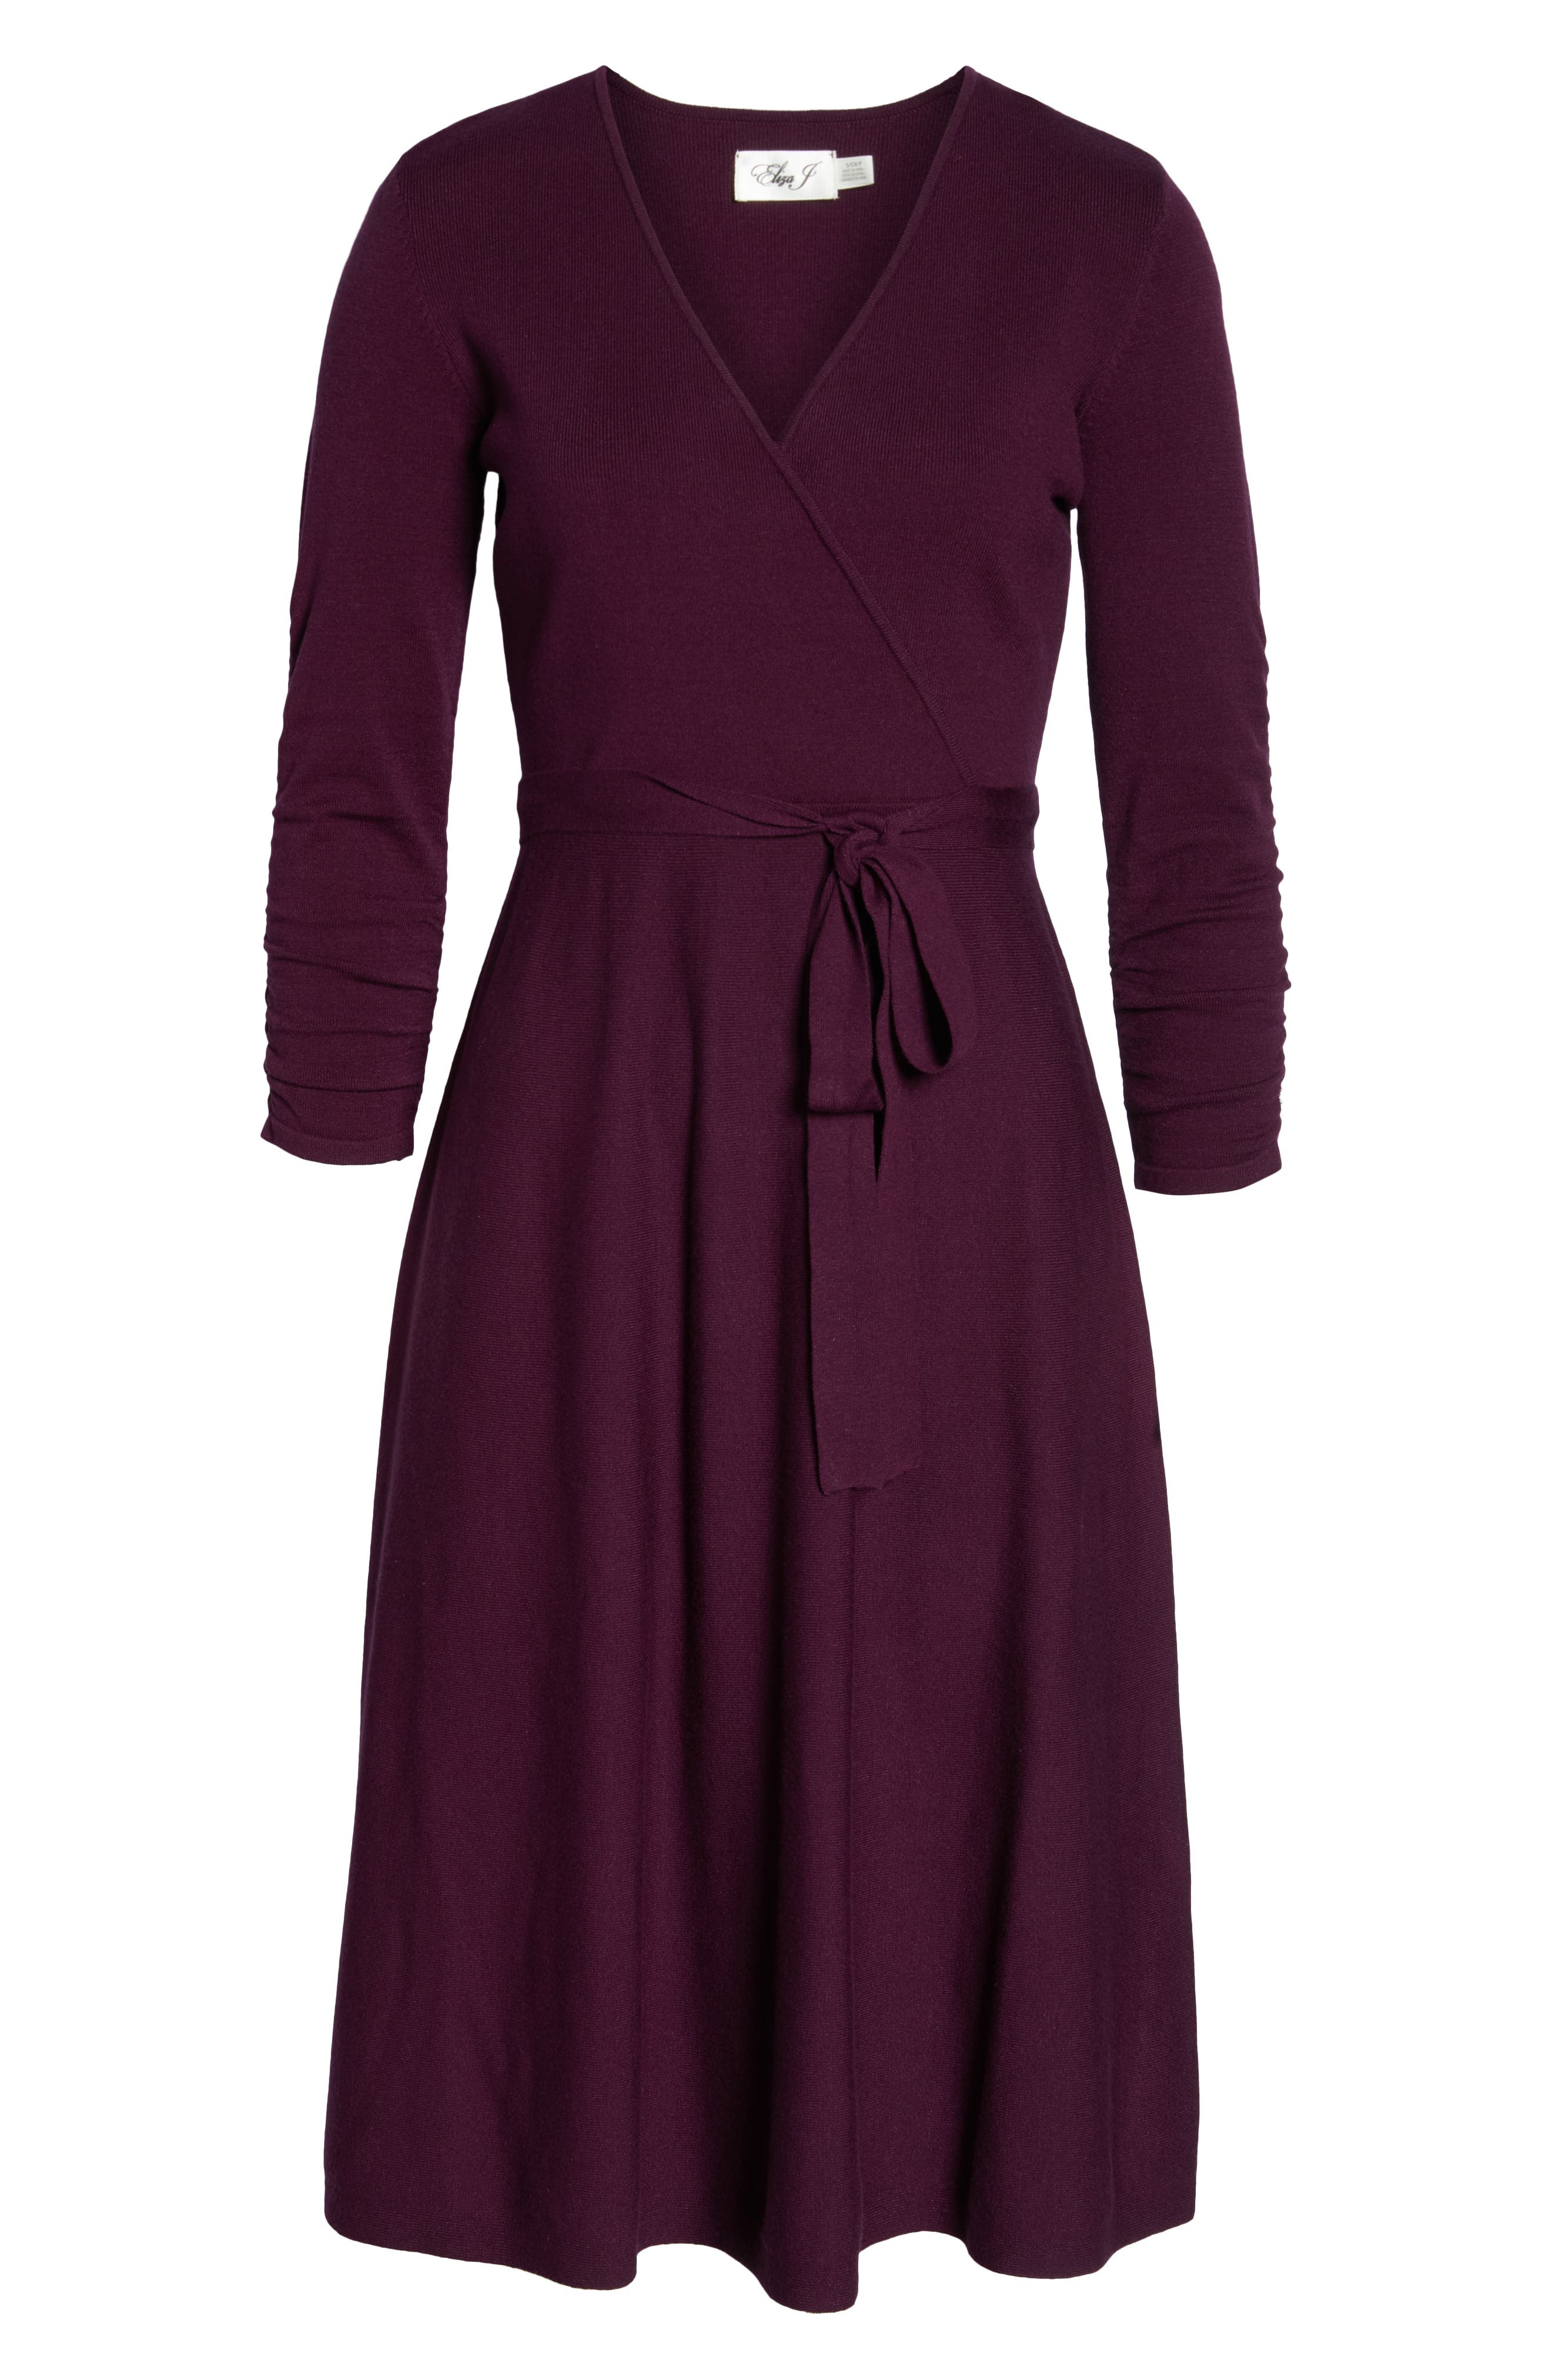 ELIZA J, Faux Wrap Sweater Dress, Alternate thumbnail 7, color, 930